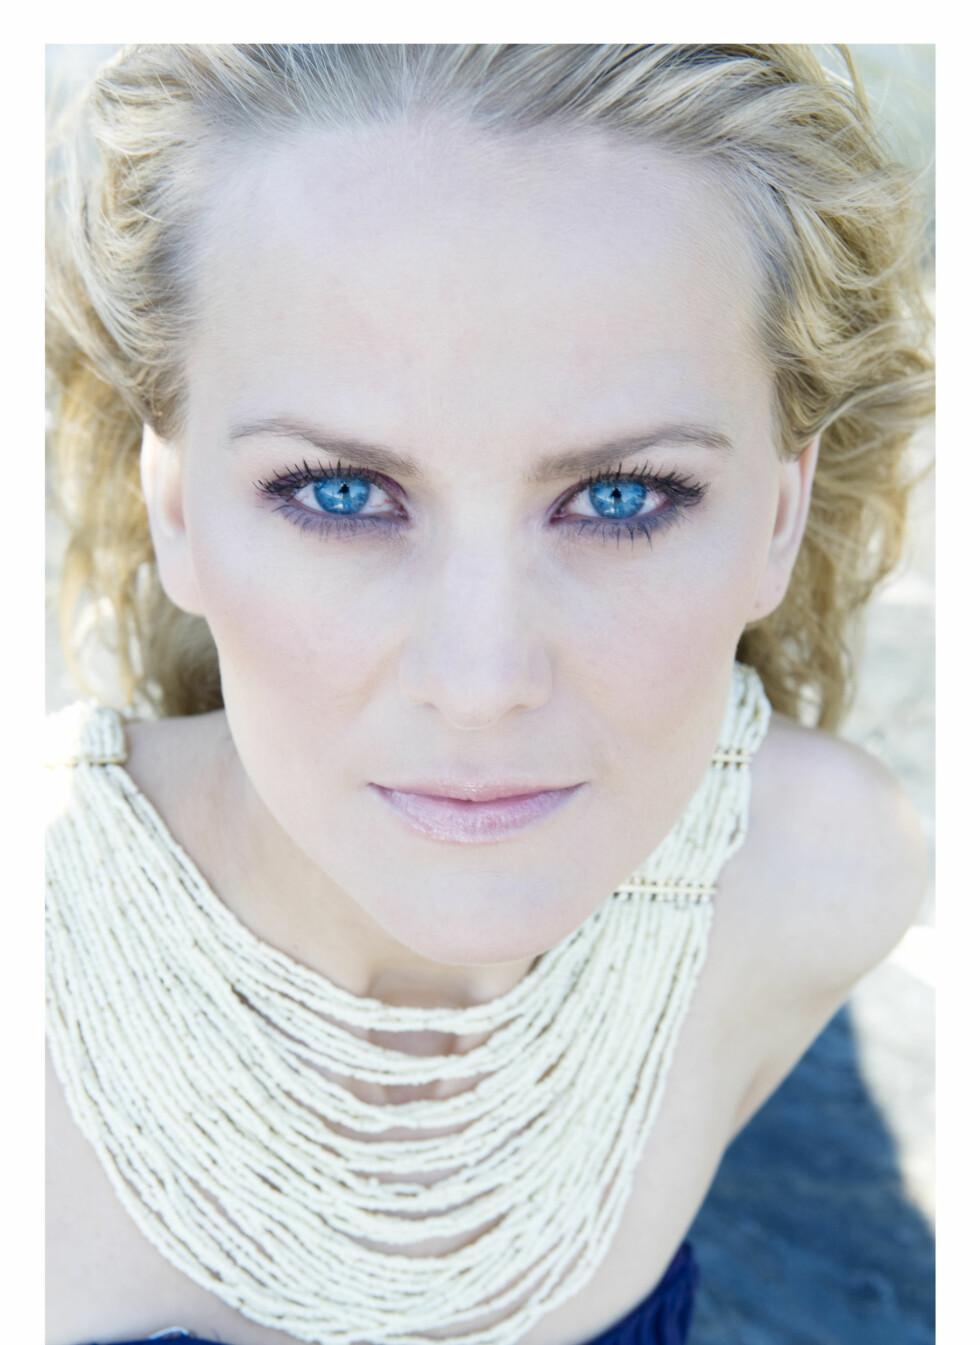 Mari skal synge hovedrollen i «Ariadne auf Naxos» på operaen i Wien. - Det er en drøm som går i oppfyllelse! Foto: Mona Nordøy. Hår og makeup: Marthe Kveli Valeberg